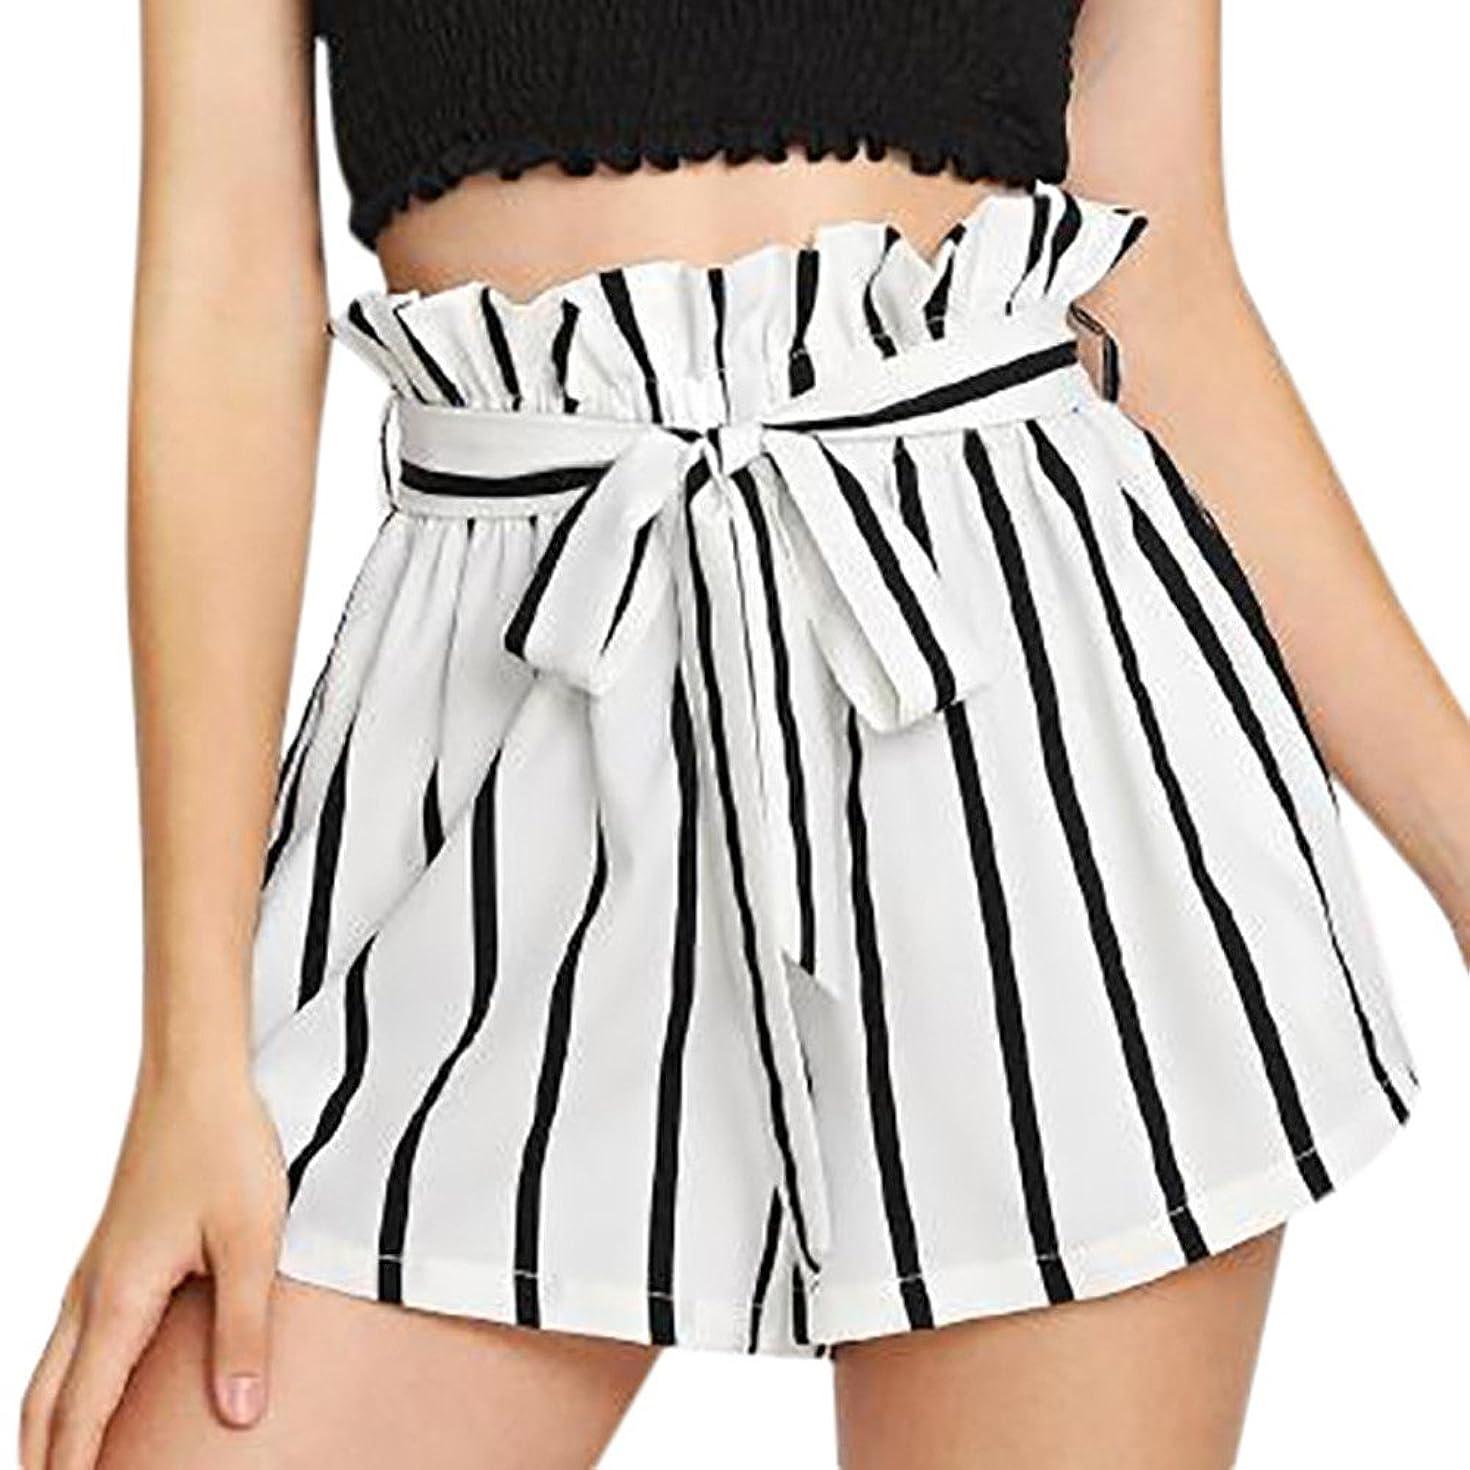 HAALIFE??Women's Casual Elastic Waist Striped Summer Beach Shorts with Pockets